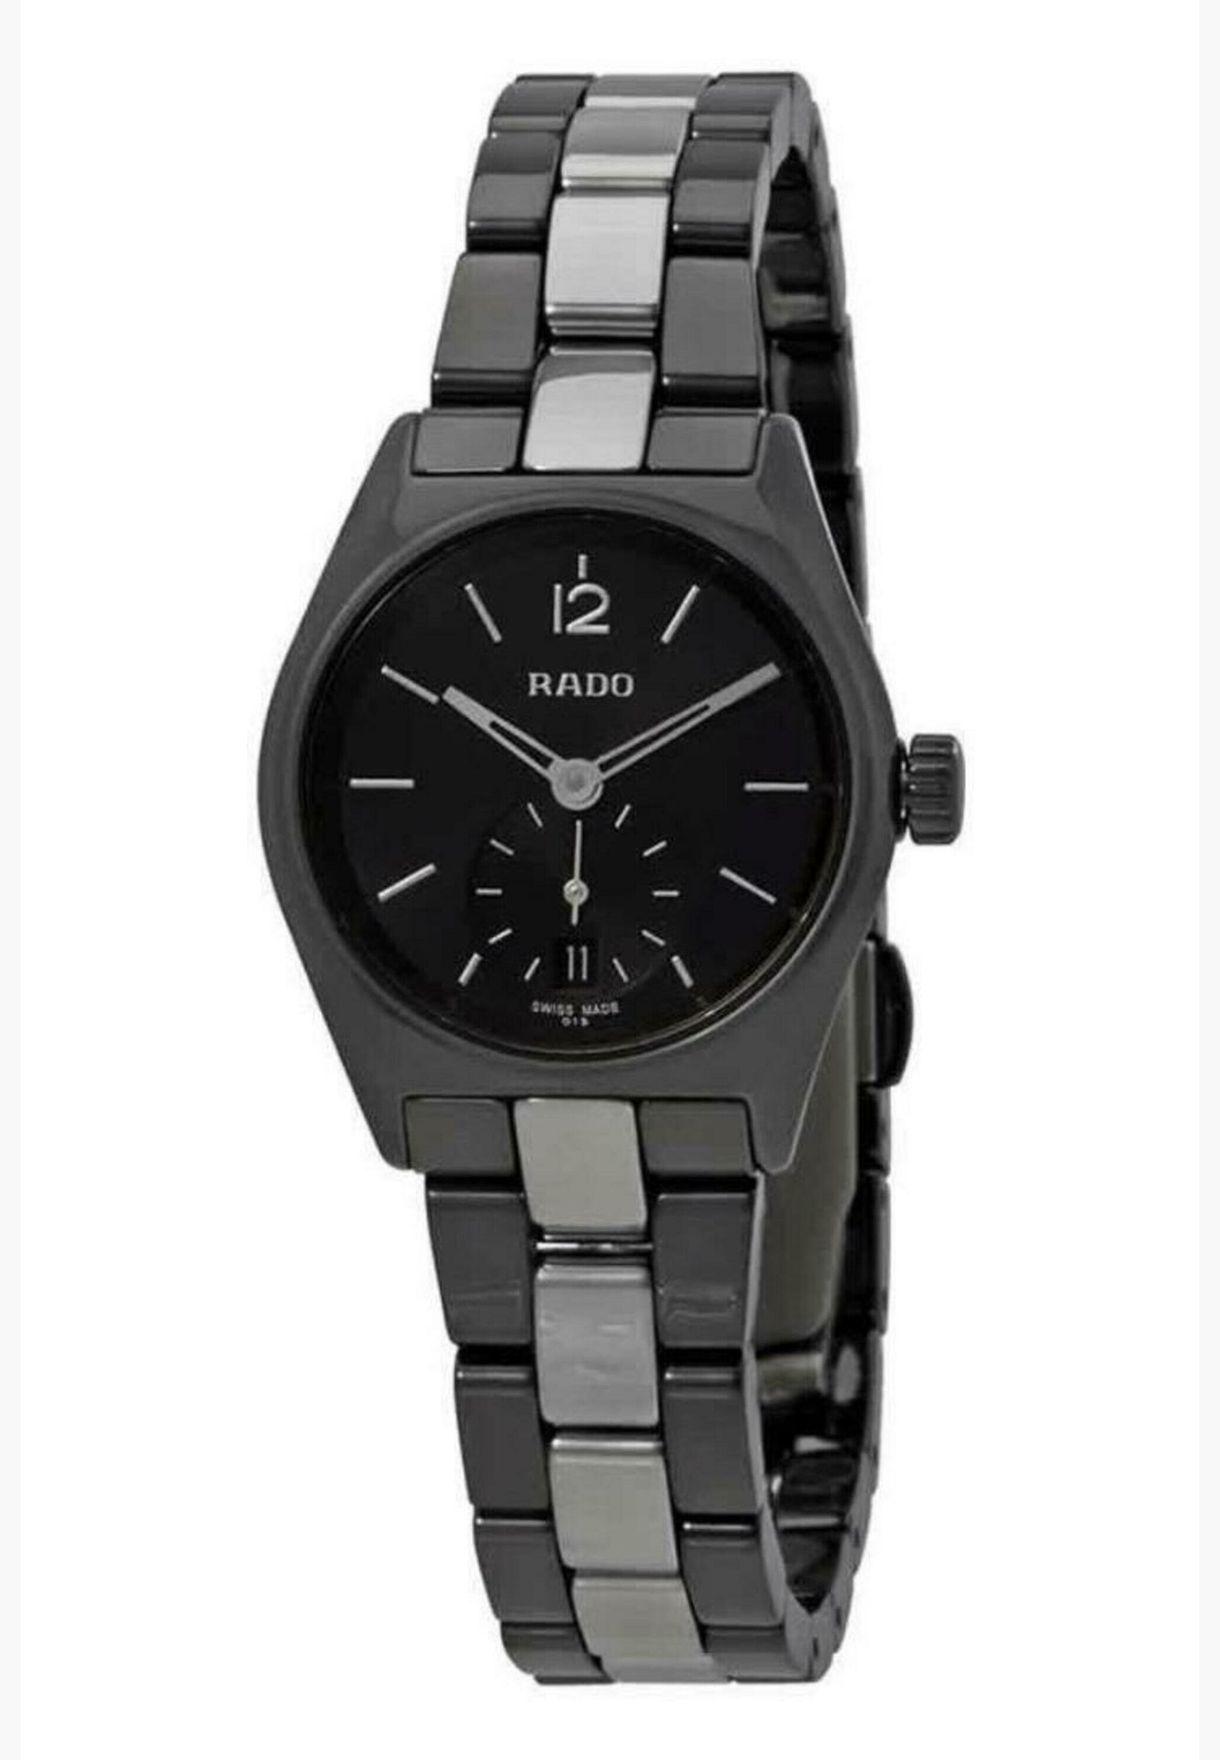 ساعة رادو رادو ترو للرجال - R27084157